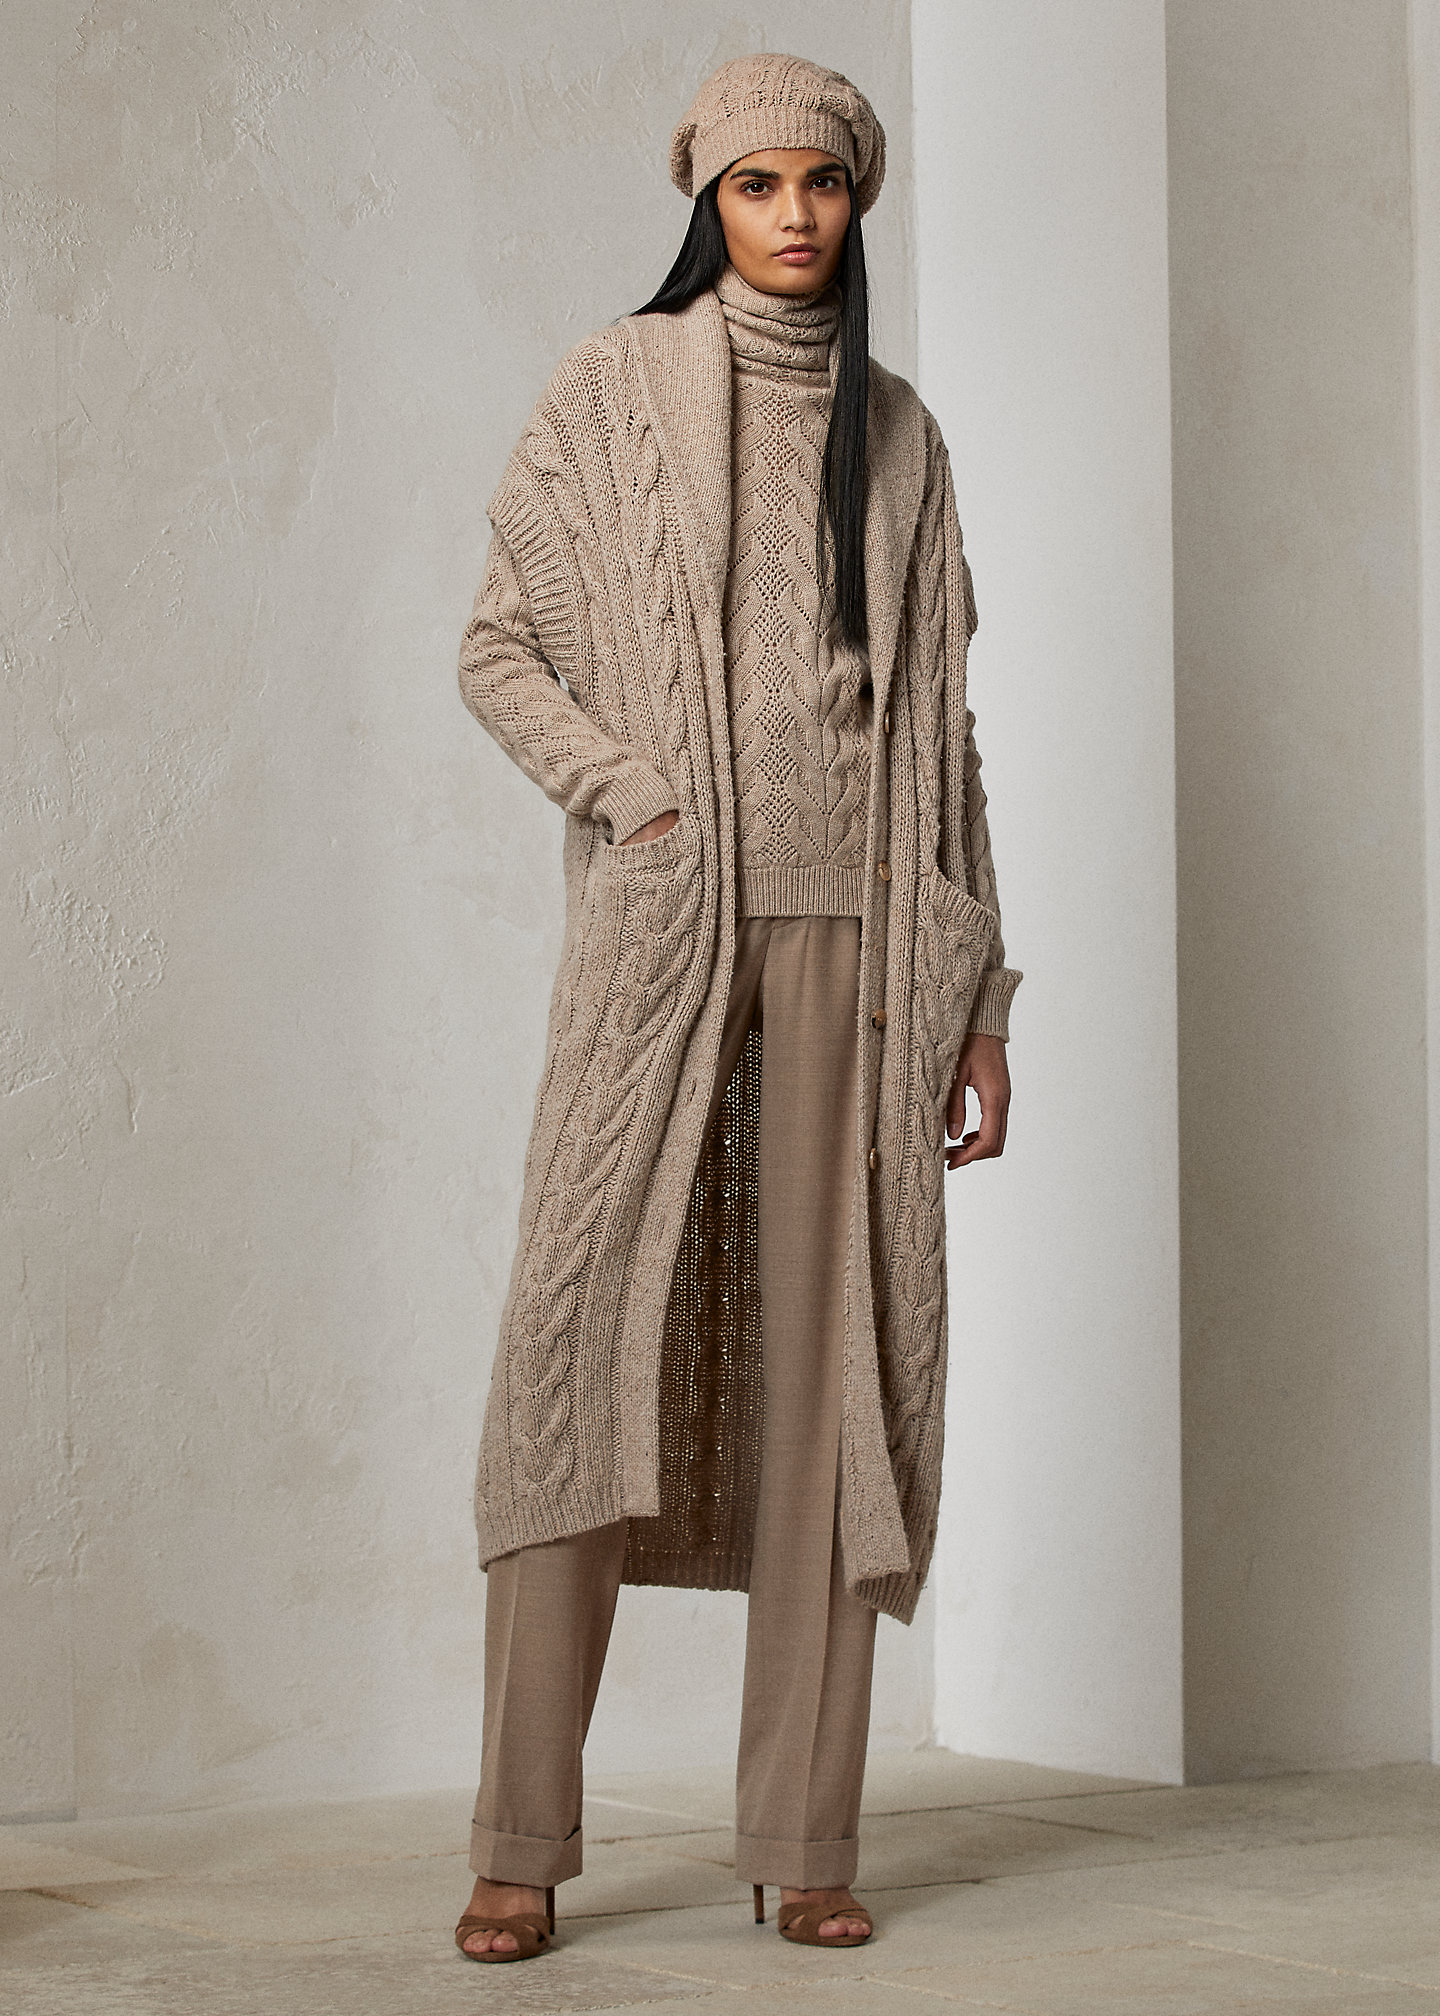 Ralph Lauren Collection Cashmere Shawl-Collar Cardigan Sweater 1